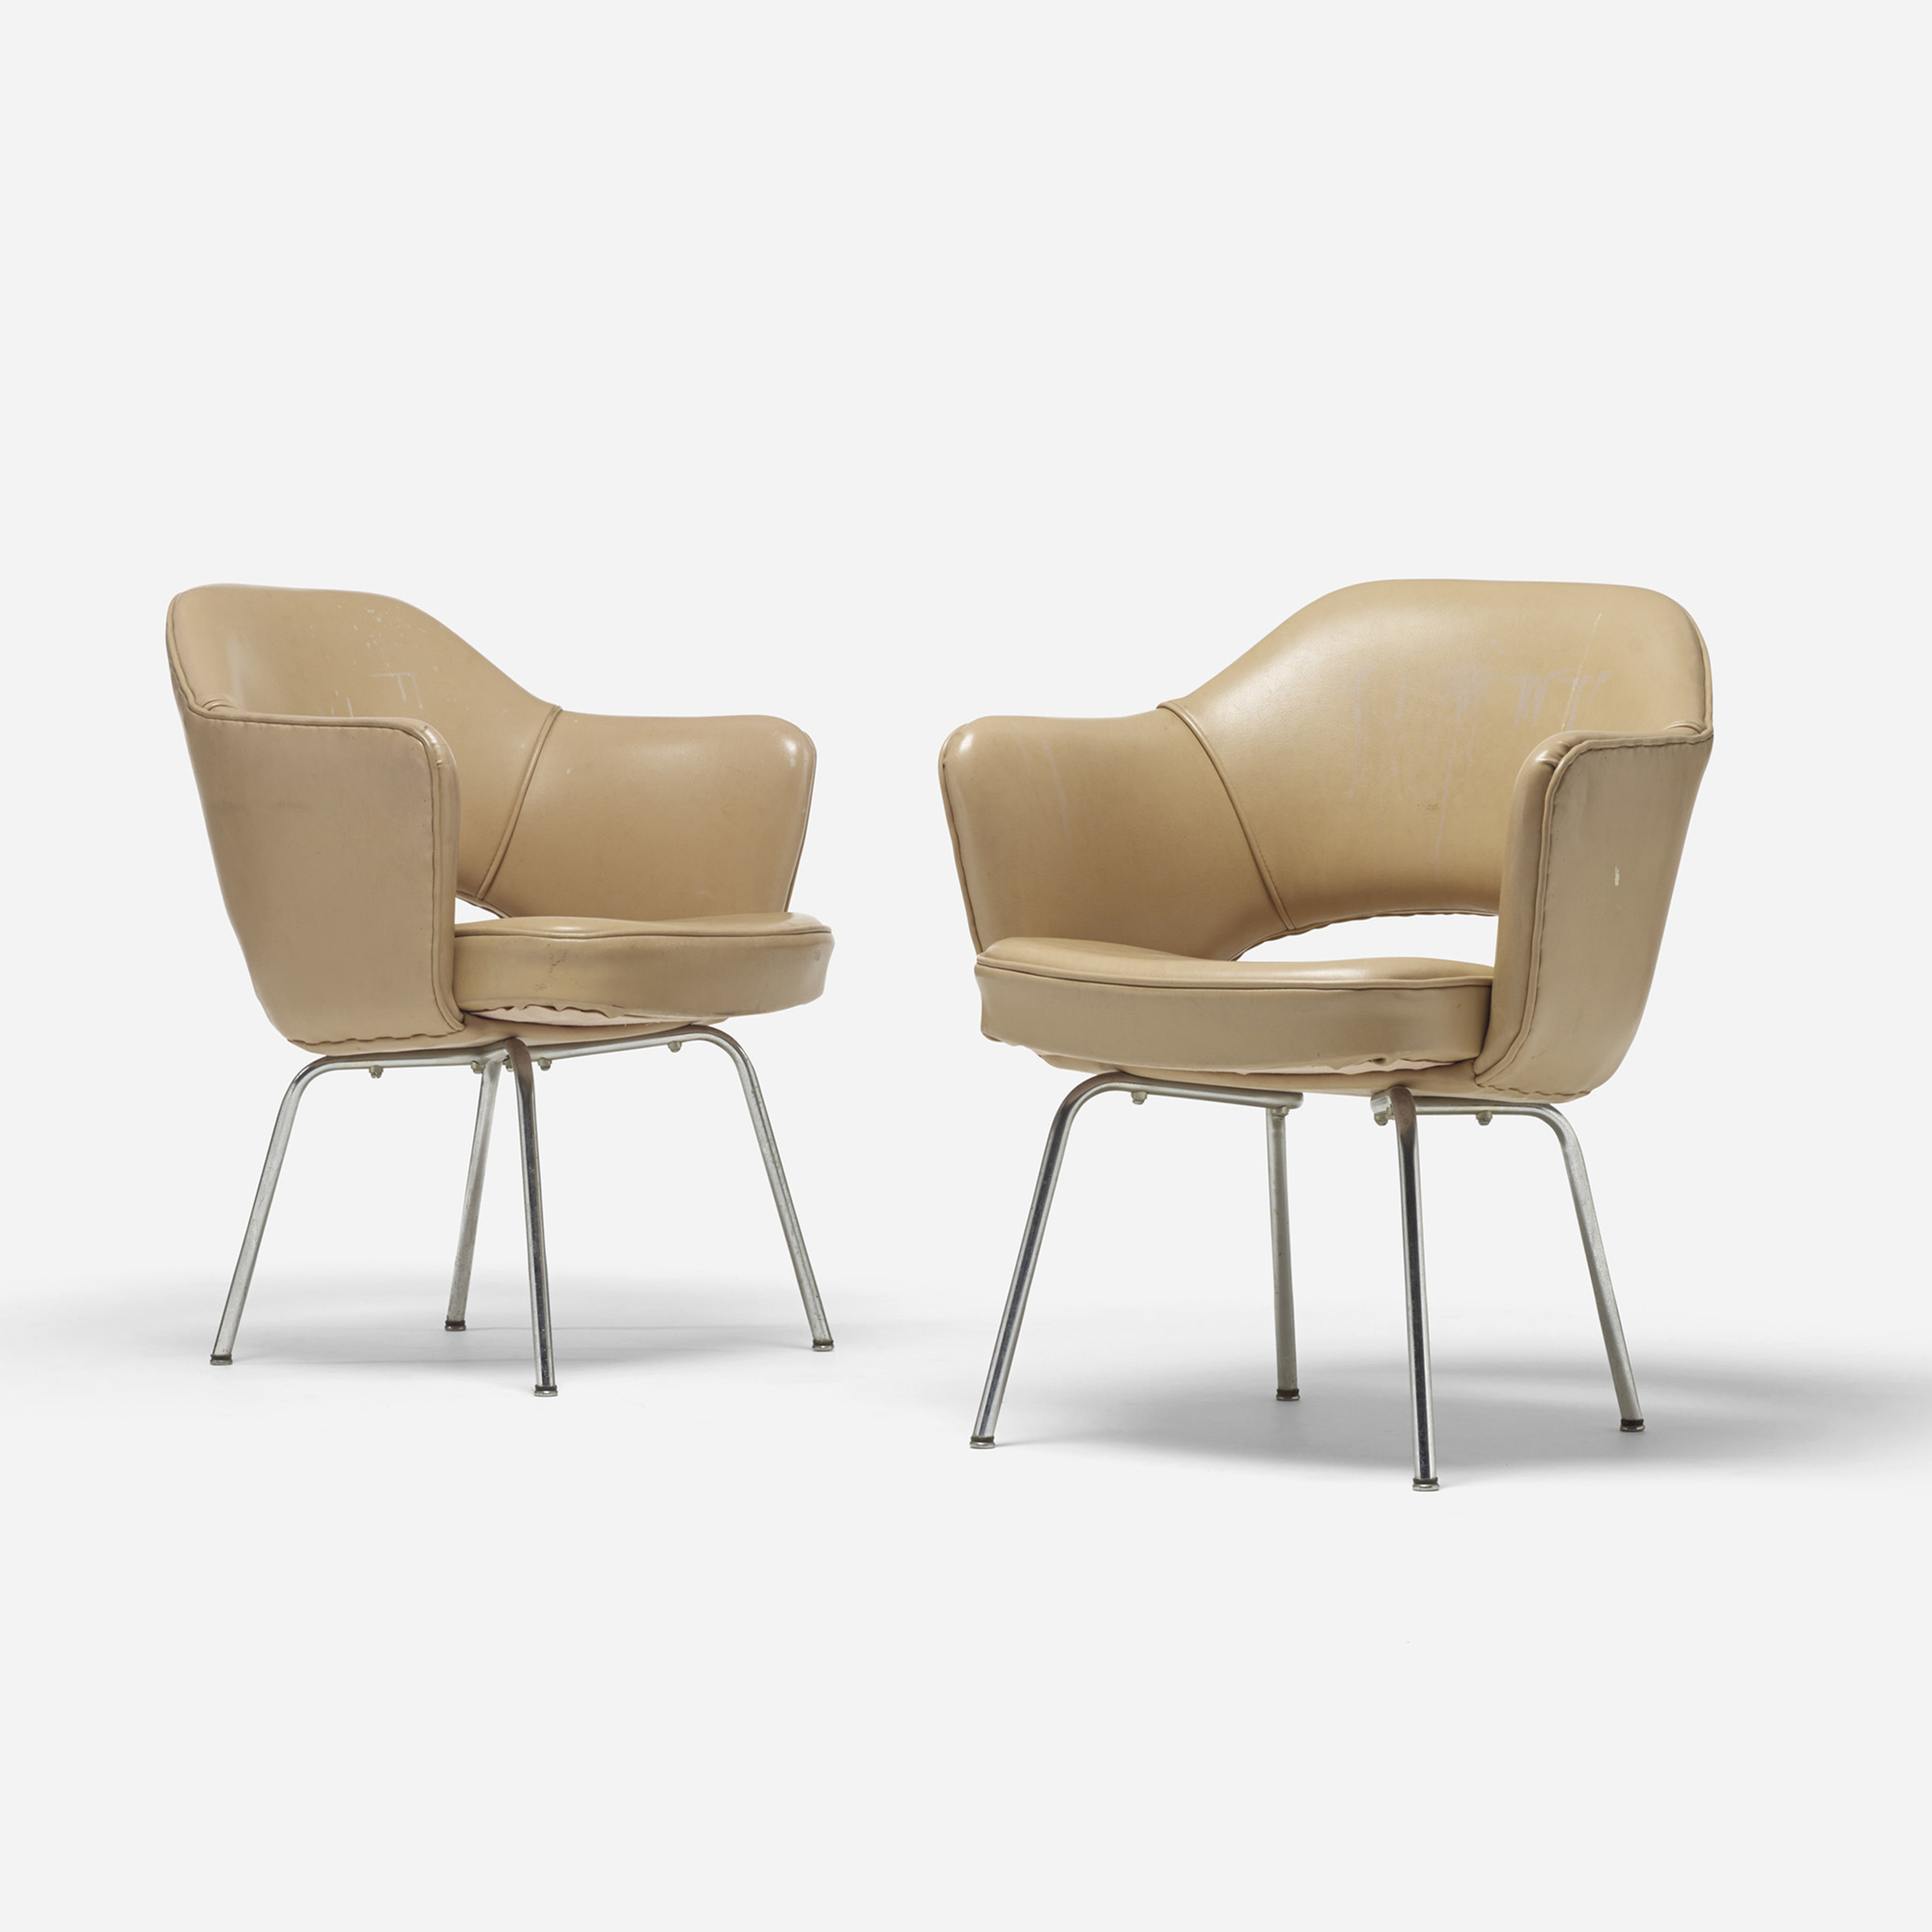 701: Eero Saarinen / Executive armchairs, pair (1 of 4)